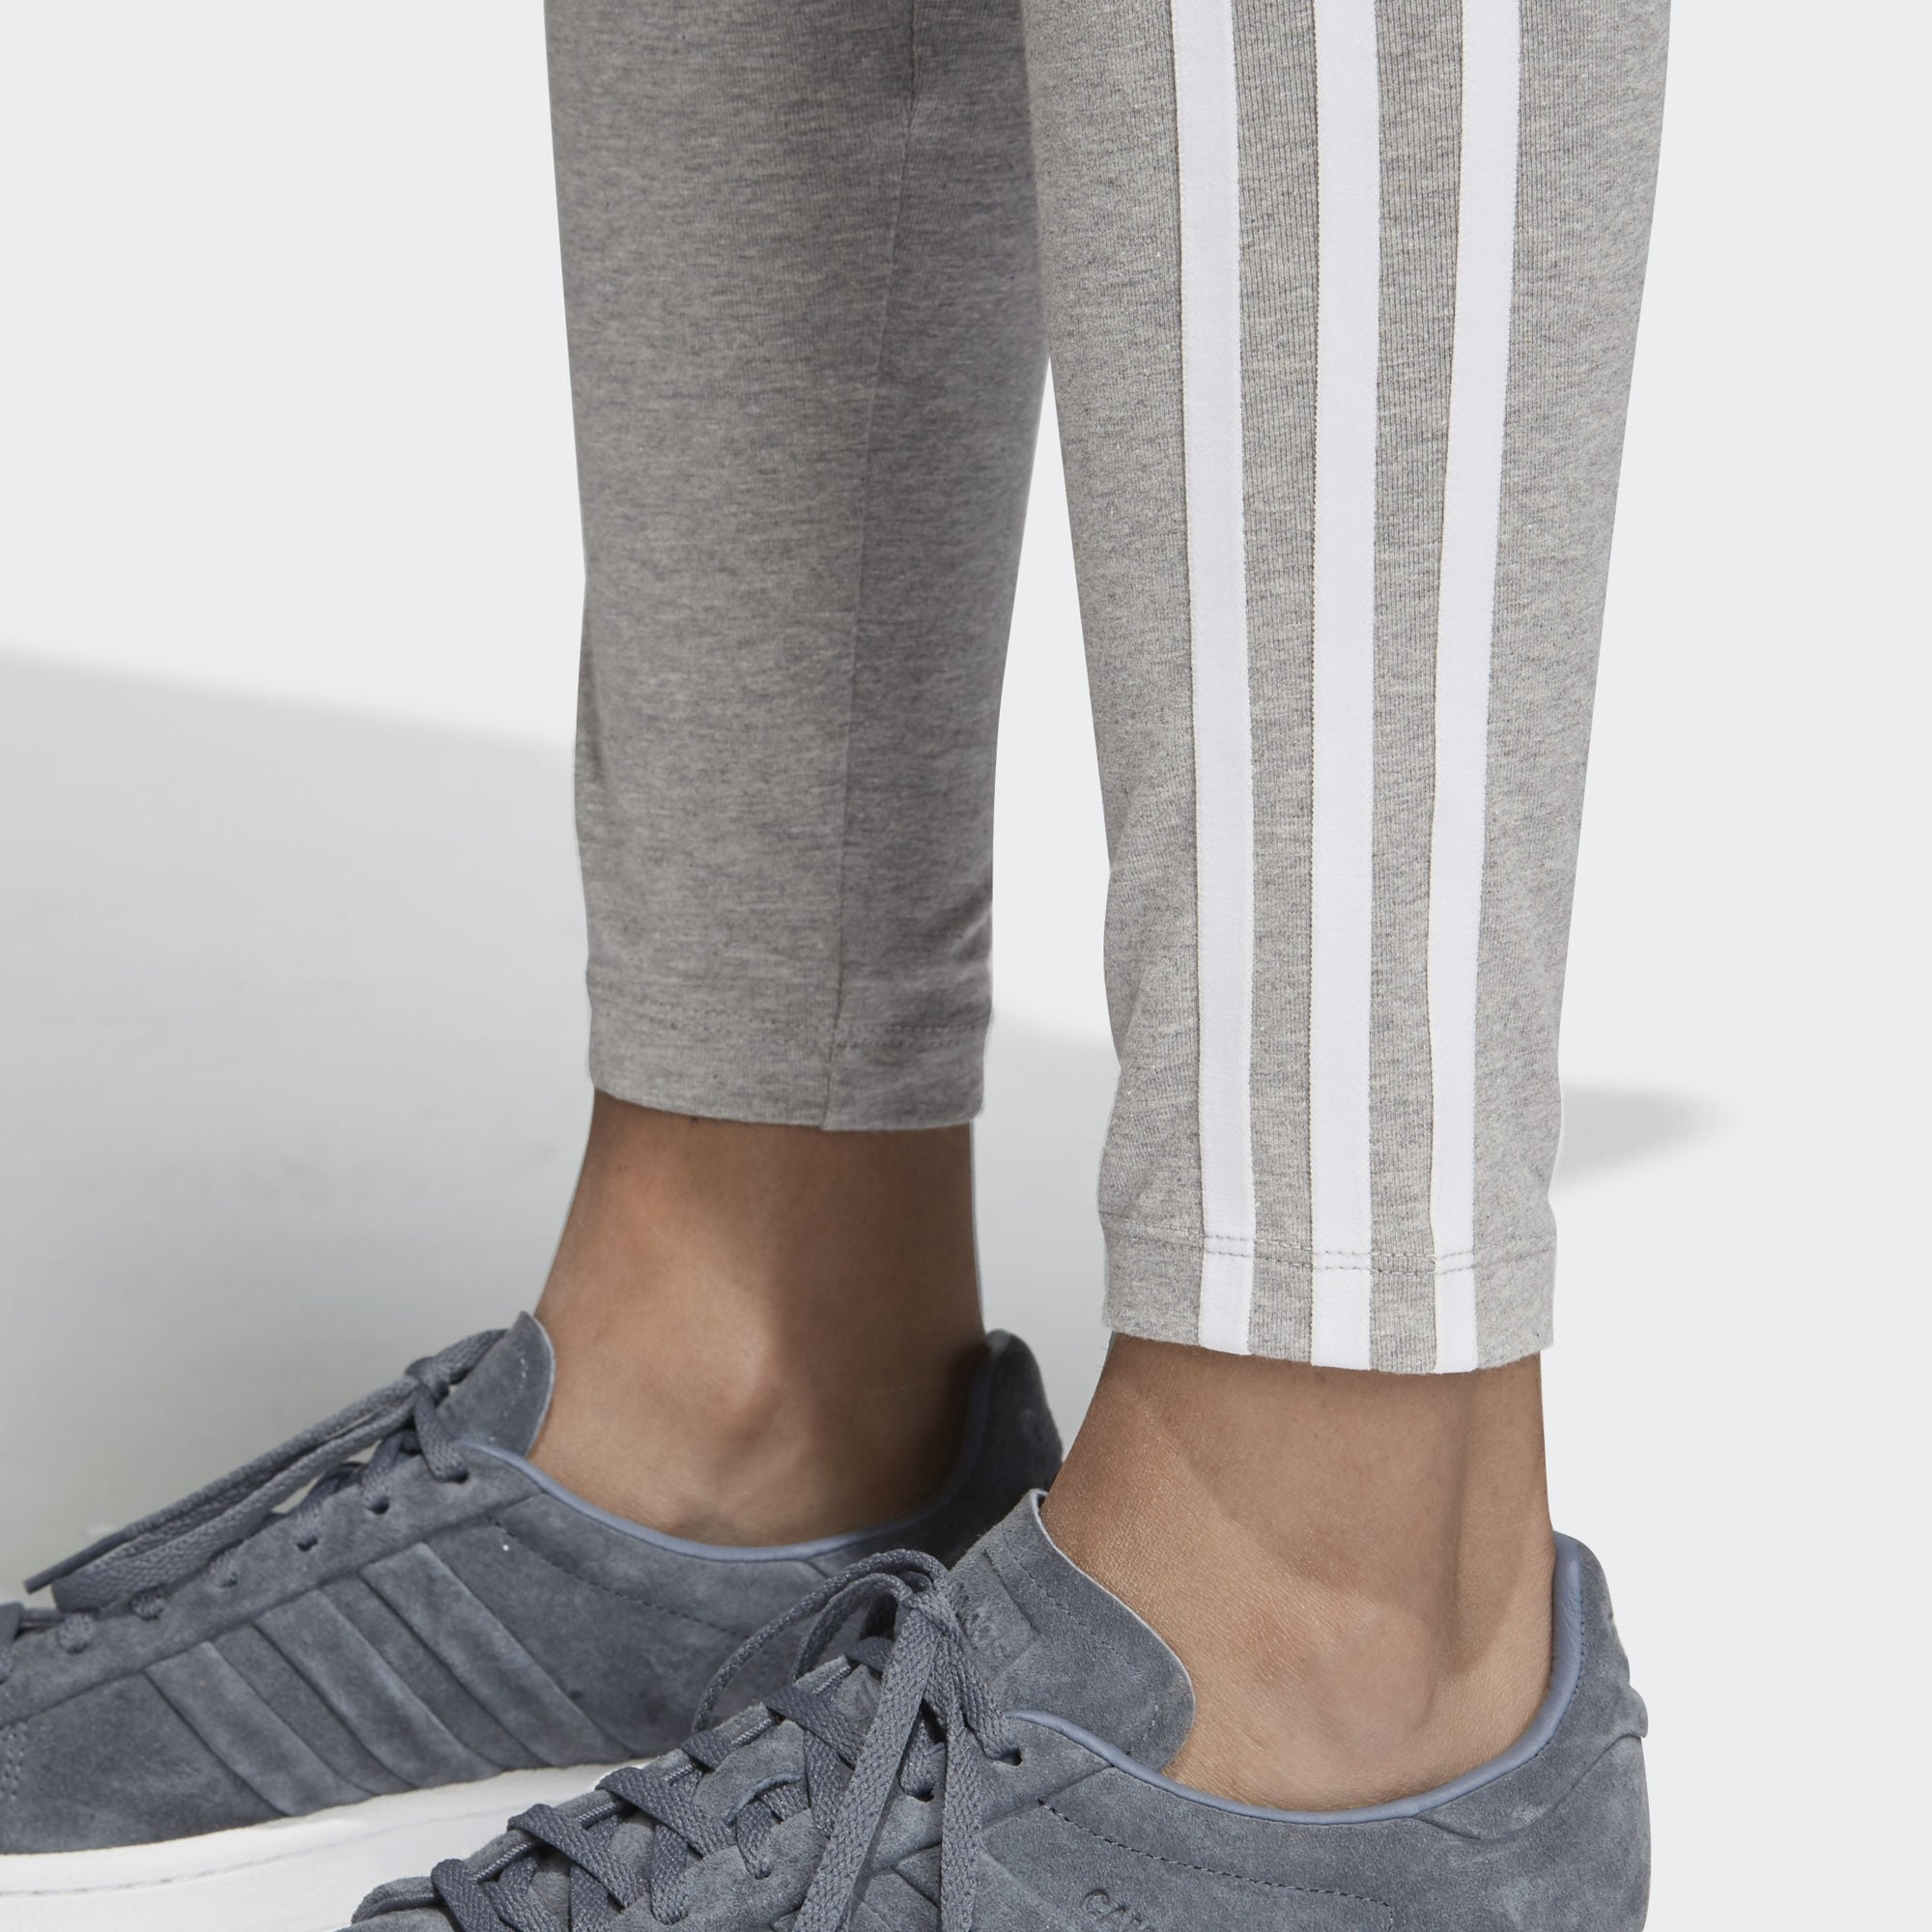 b5e1871eff2 Adidas Grey 3 Stripe Tights CY4761-3   Stuarts London